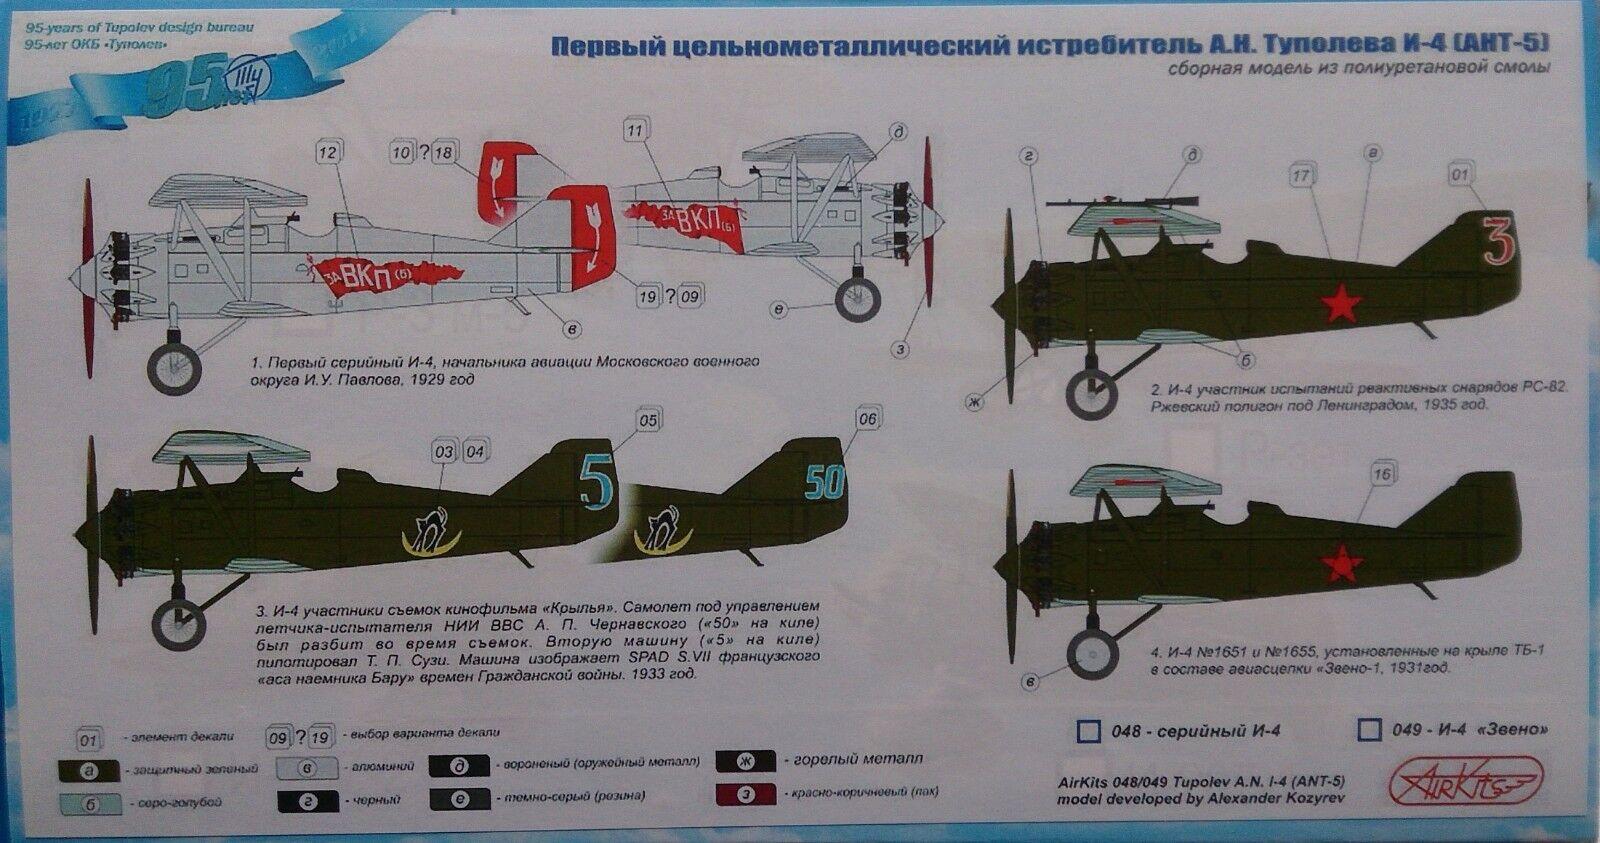 1 72 AirKits   KAjuK  049 - Tupolev I-4 (ANT-5) 'Zveno', resin kit with decal